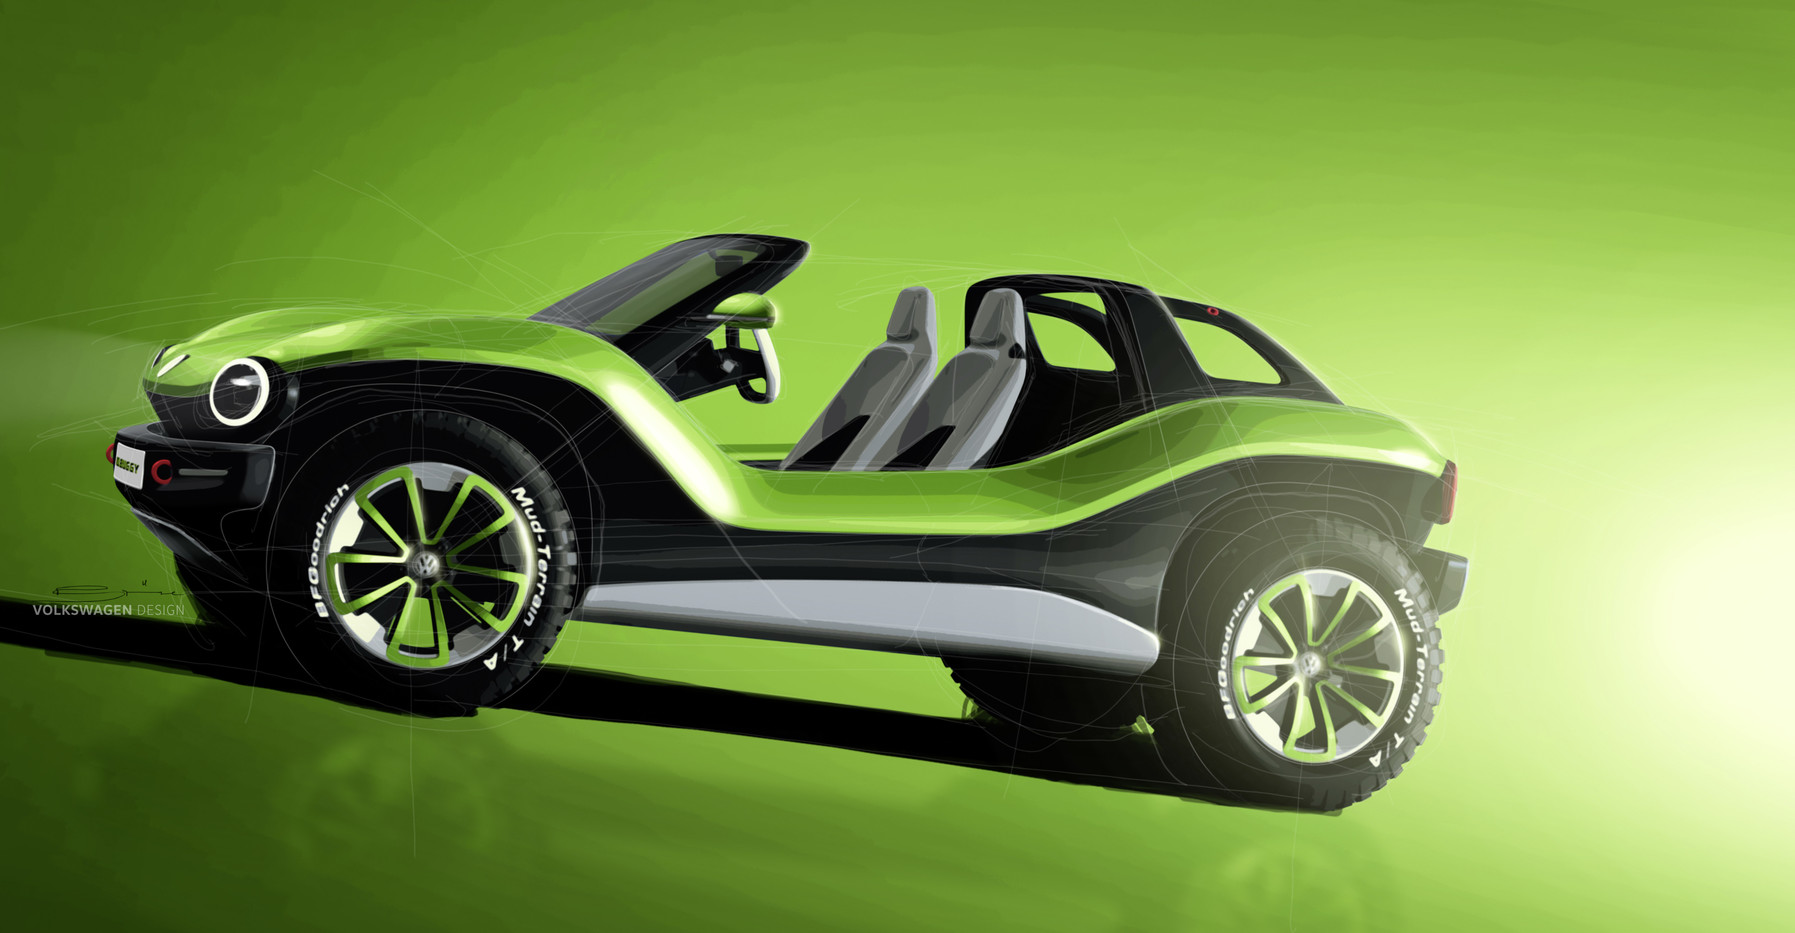 Volkswagen I.D. Buggy green background